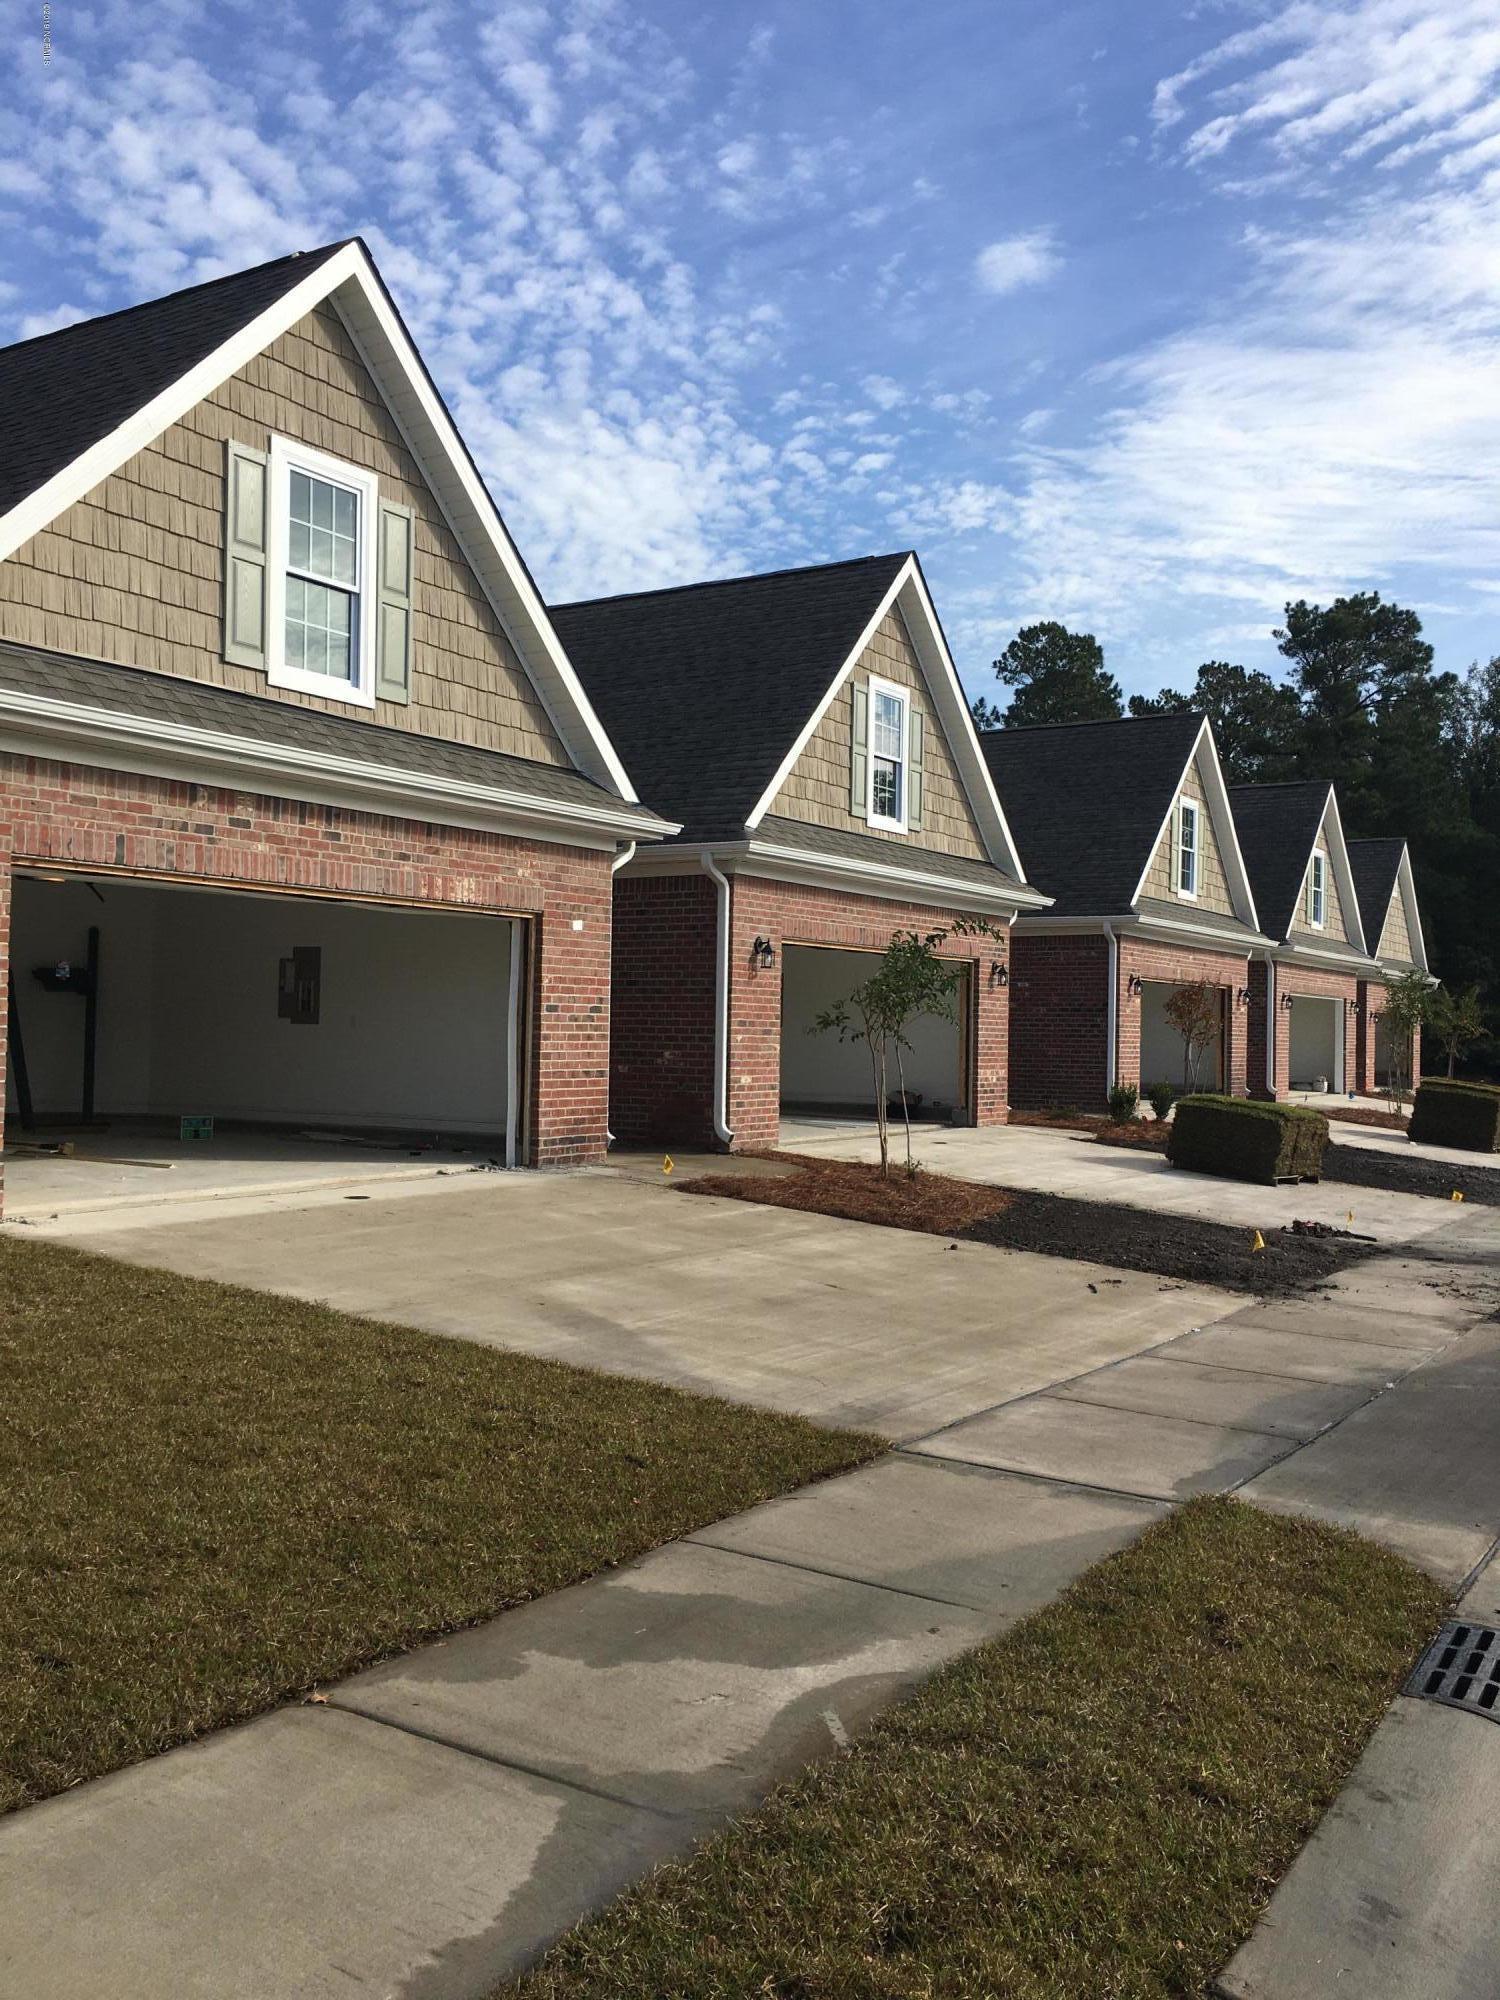 1269 Greensview Circle Leland, NC 28451